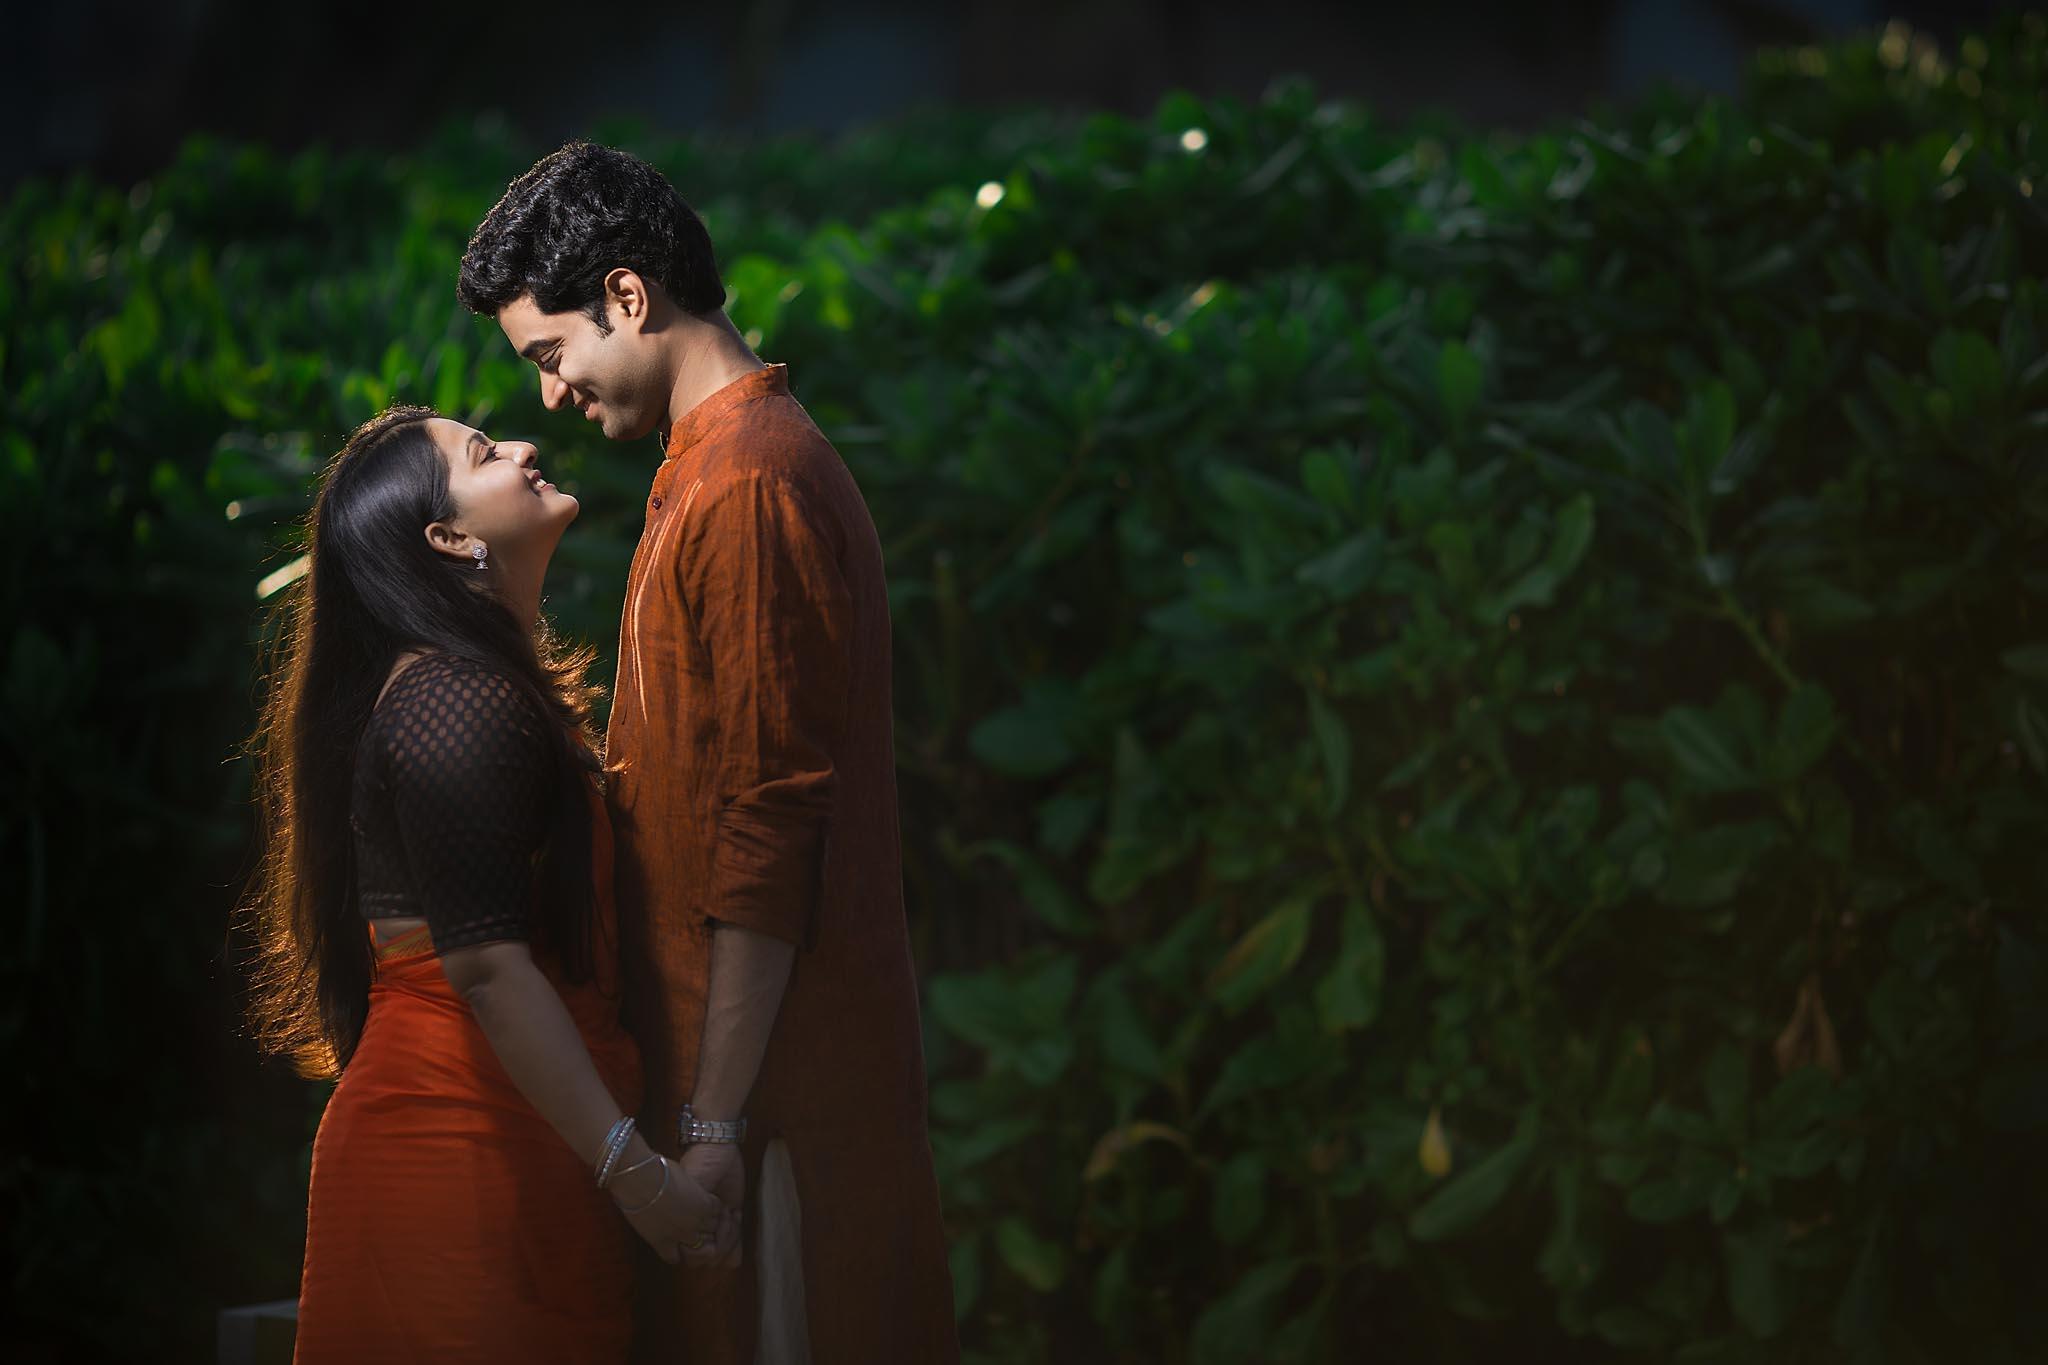 Best-of-2018-wedding-photography-focuz-studios-2